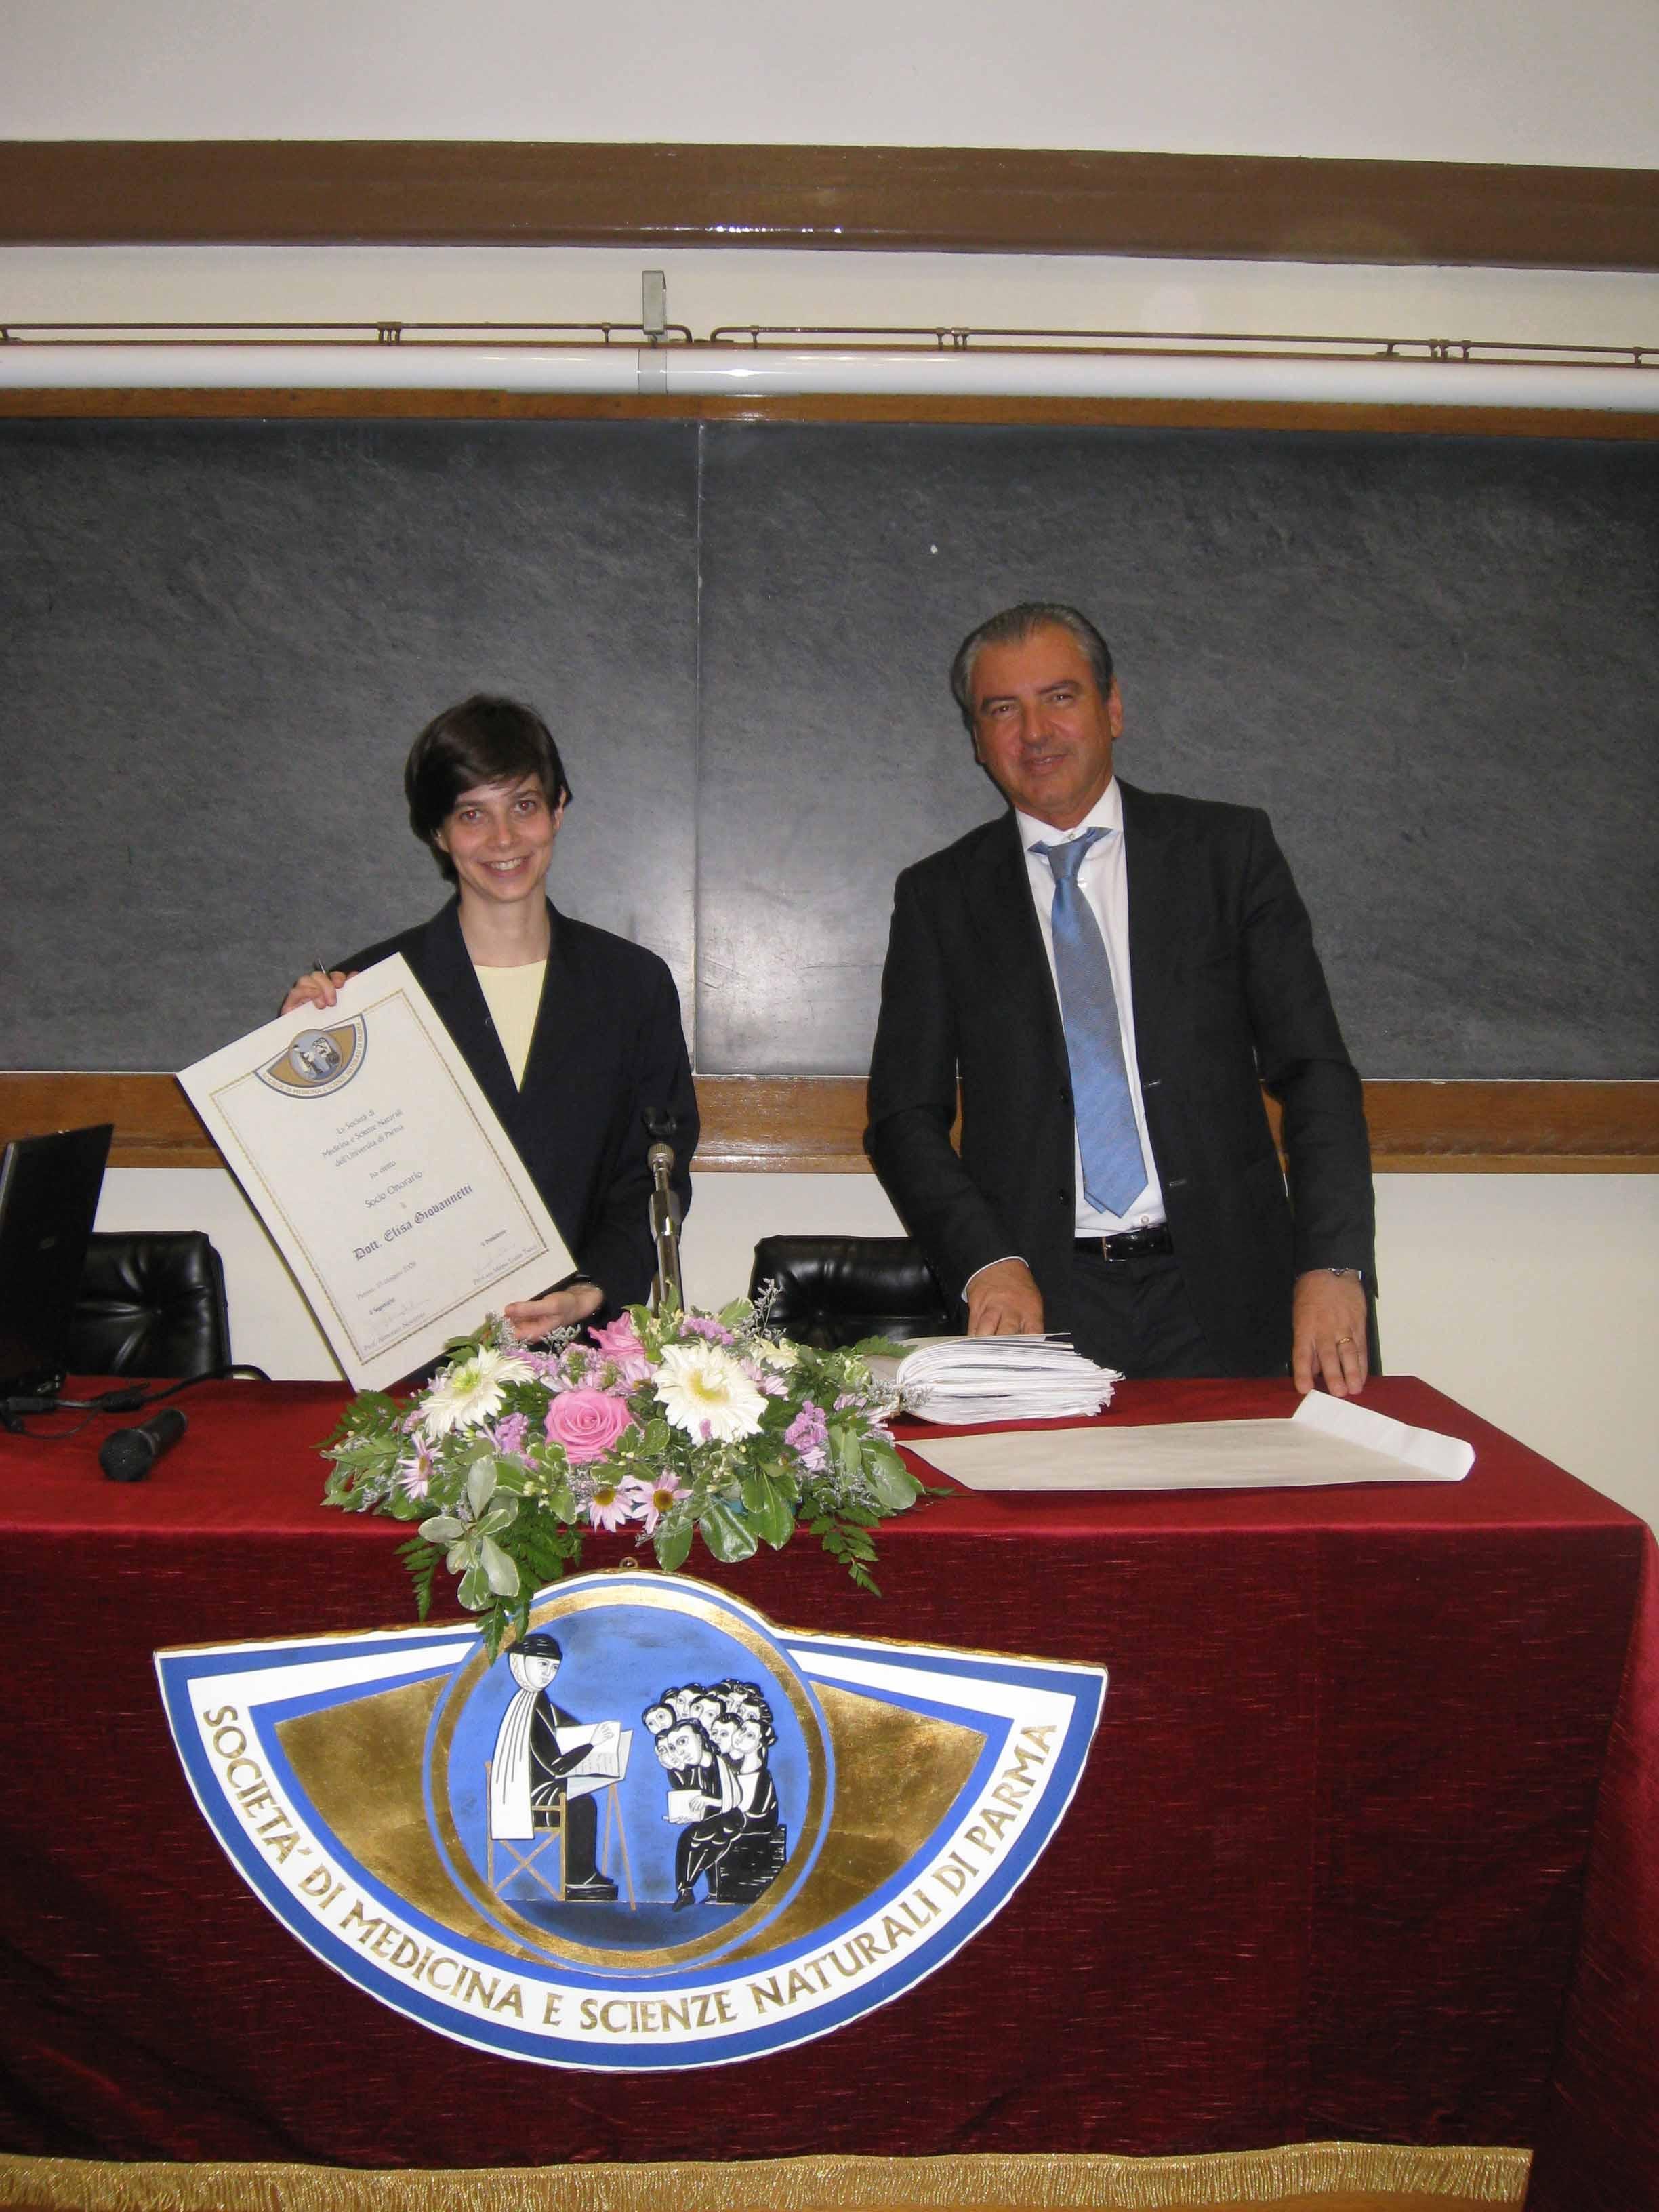 Seminar of Dr. Giovannetti at Parma University